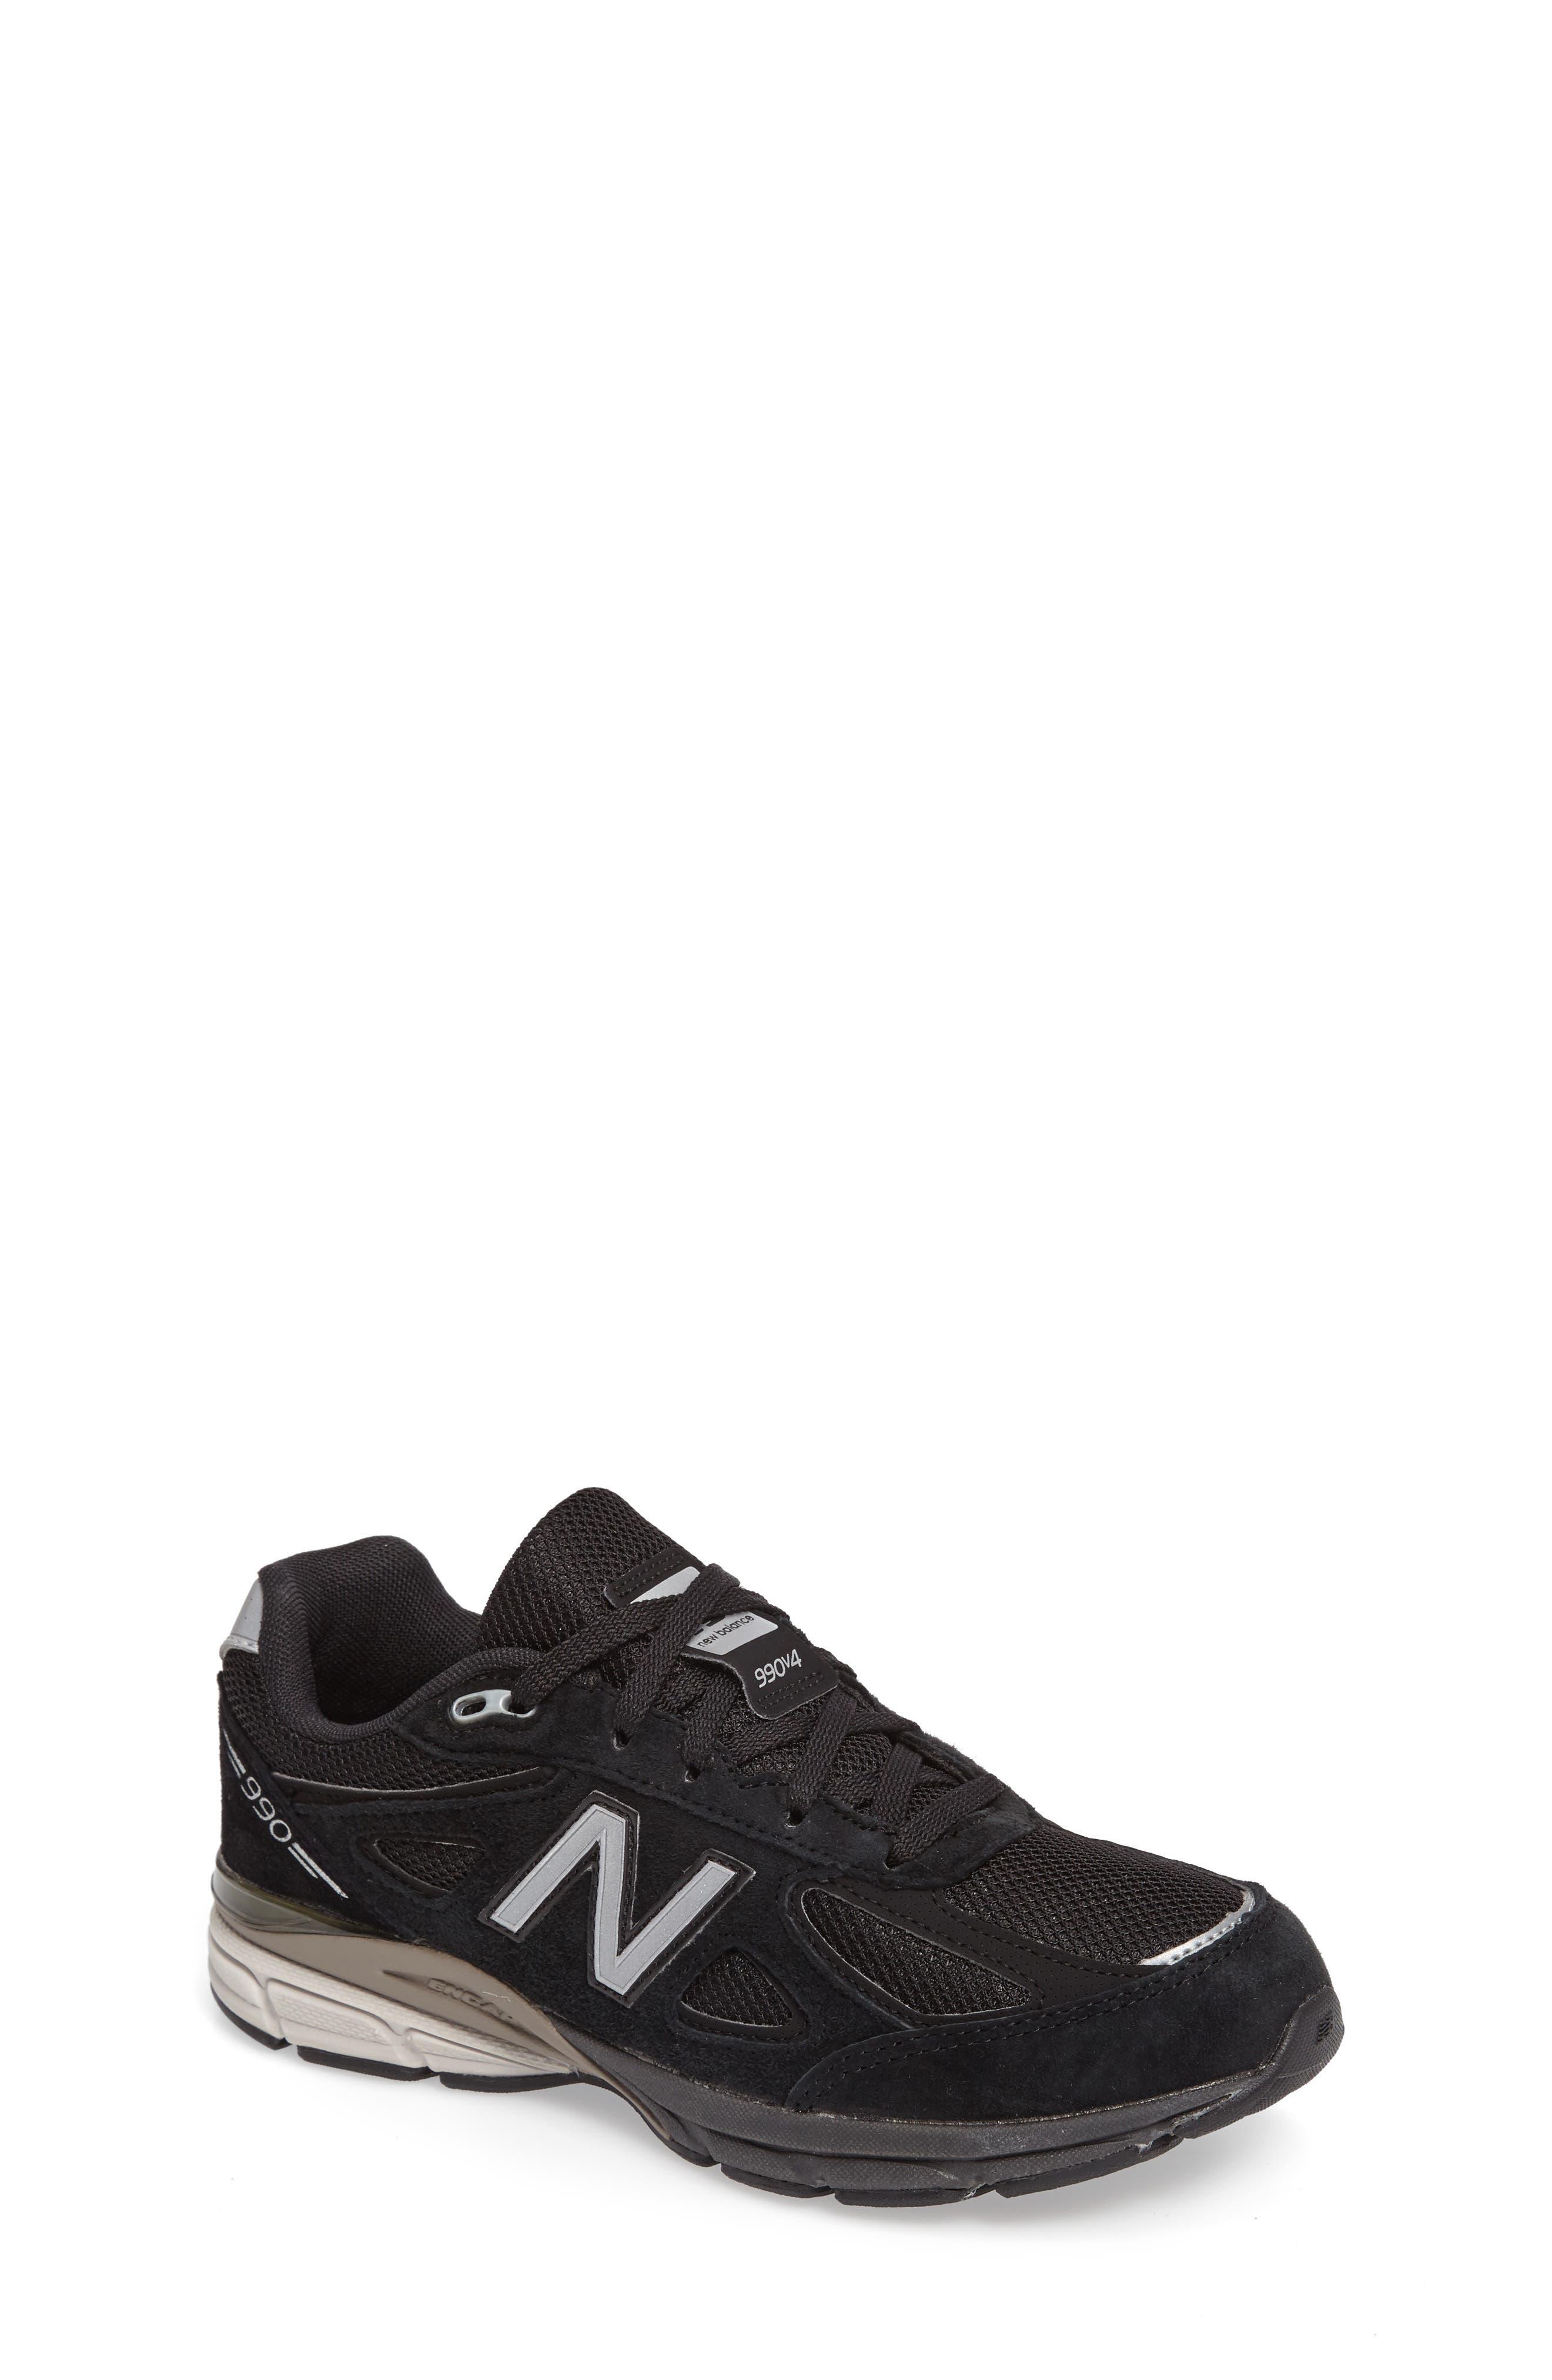 990v4 Sneaker,                             Main thumbnail 1, color,                             001